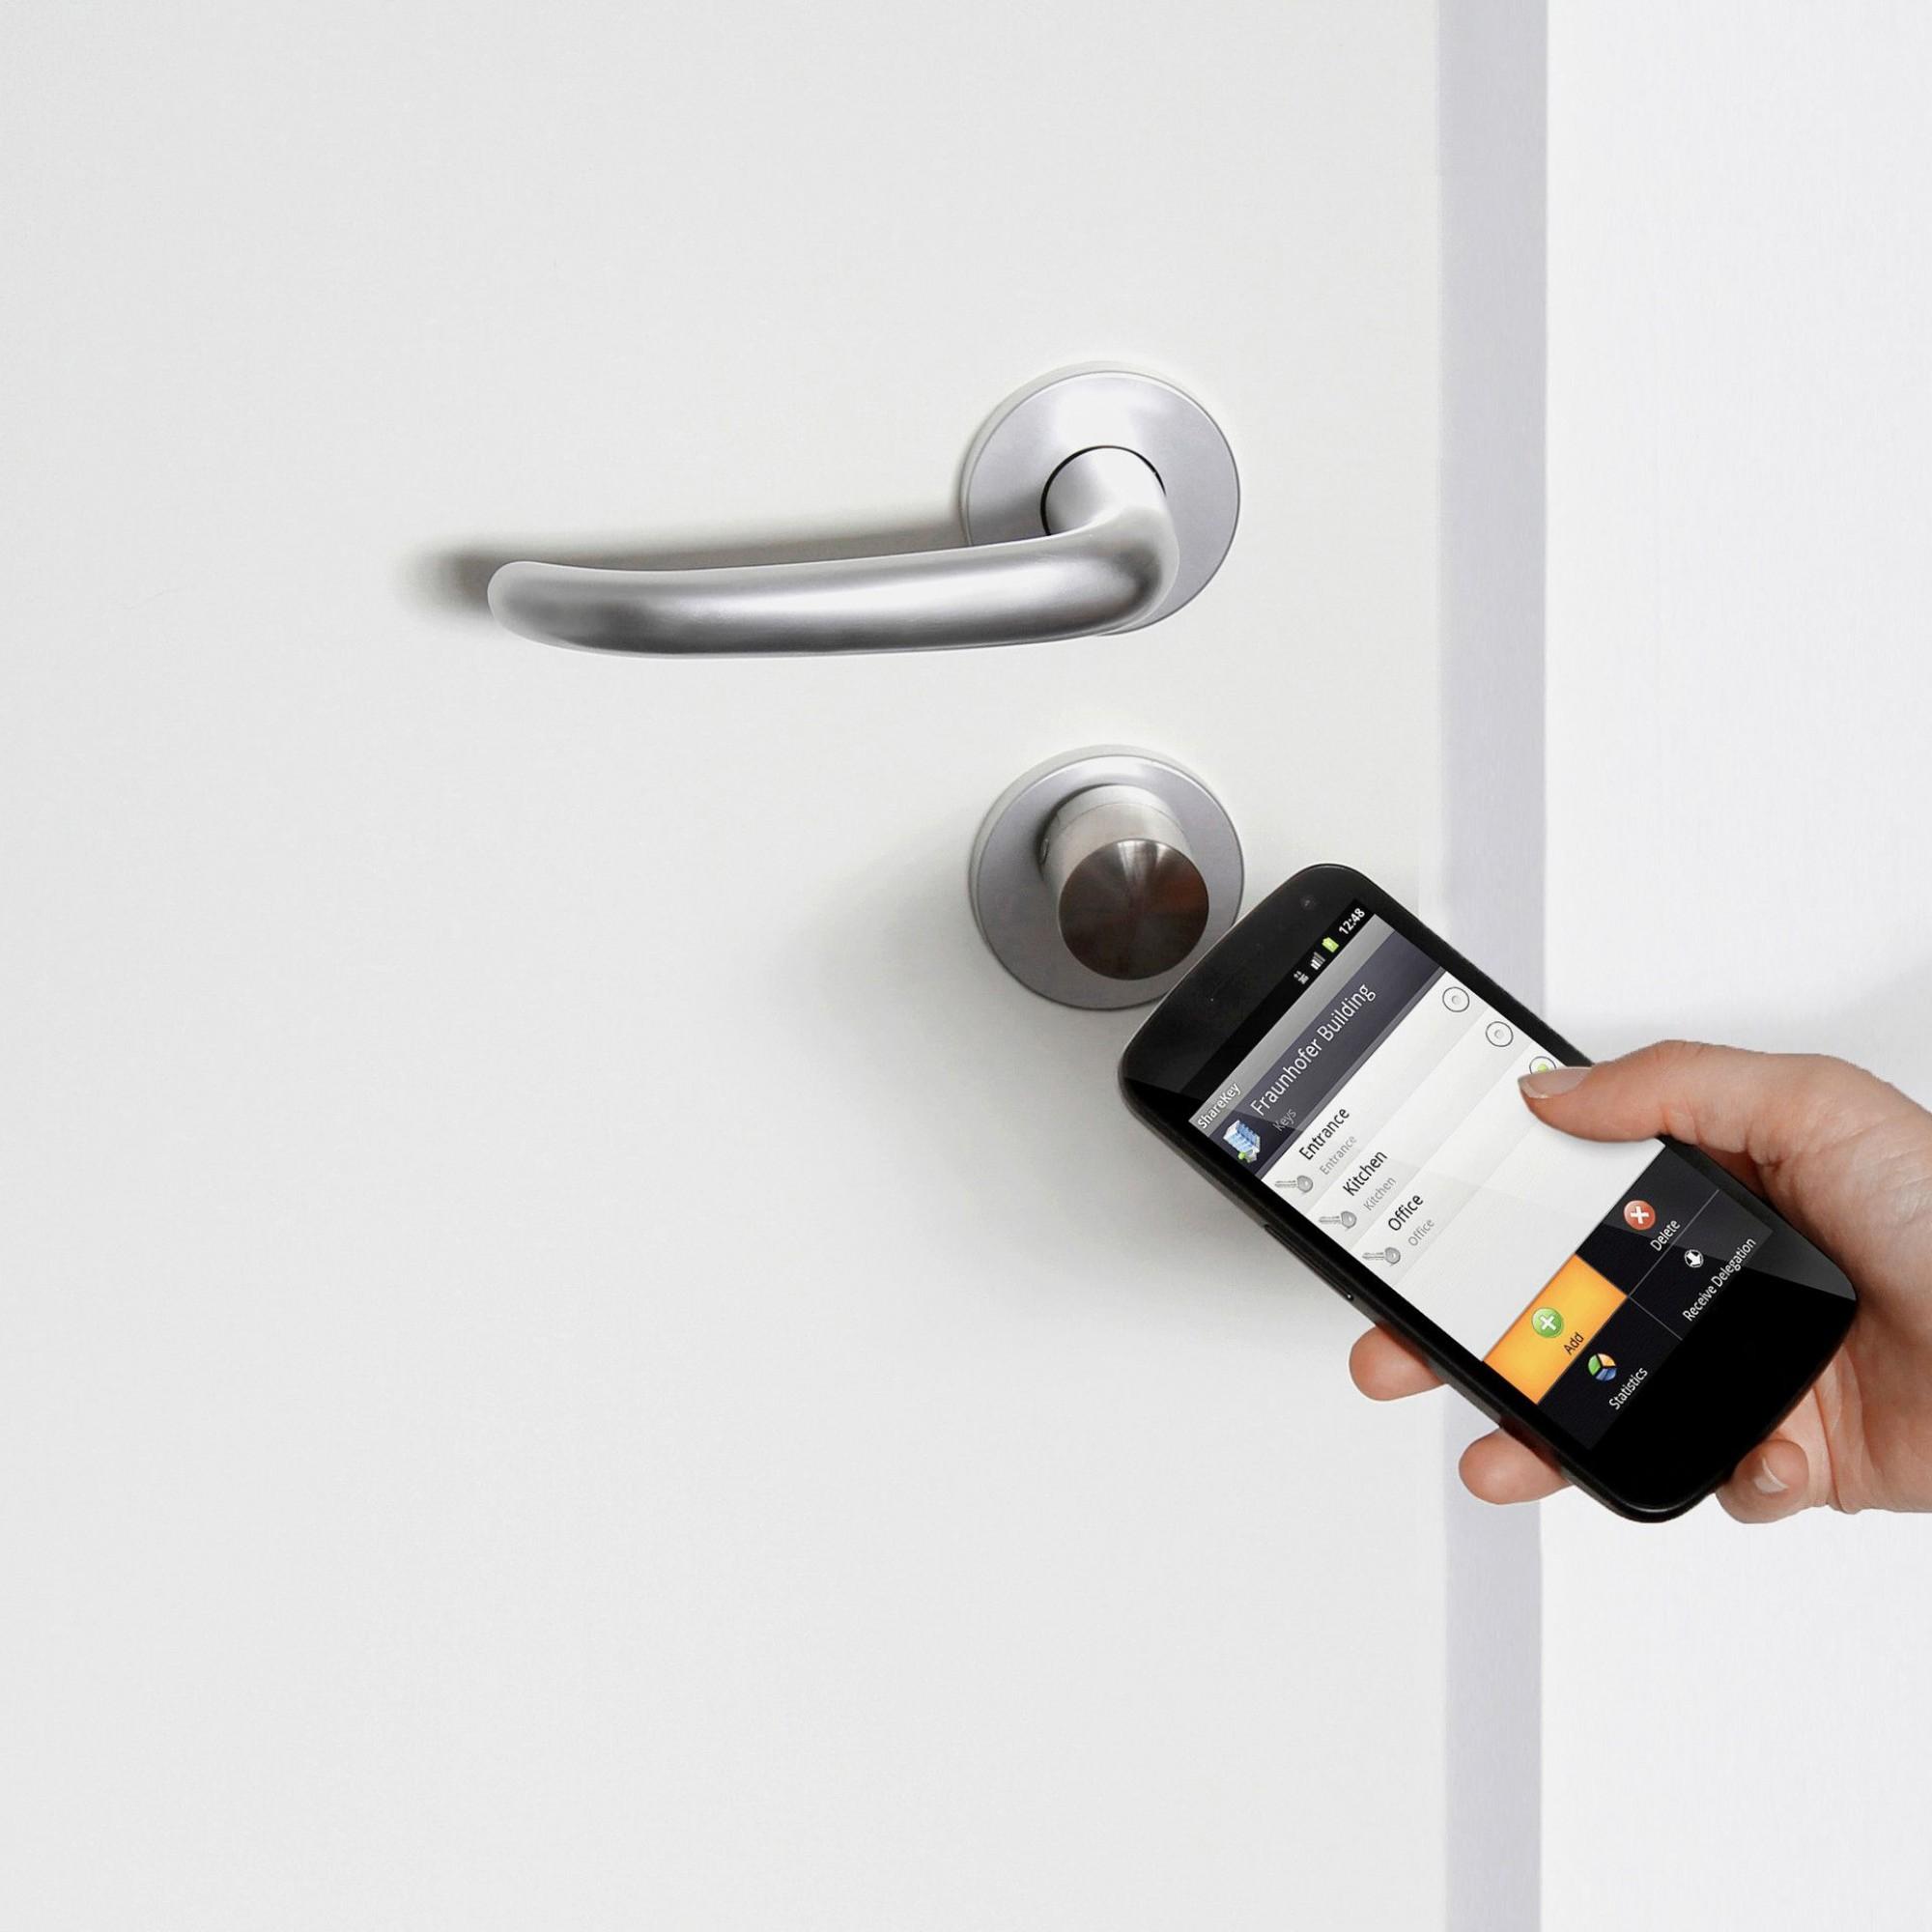 Smartphone als Hausschlüssel